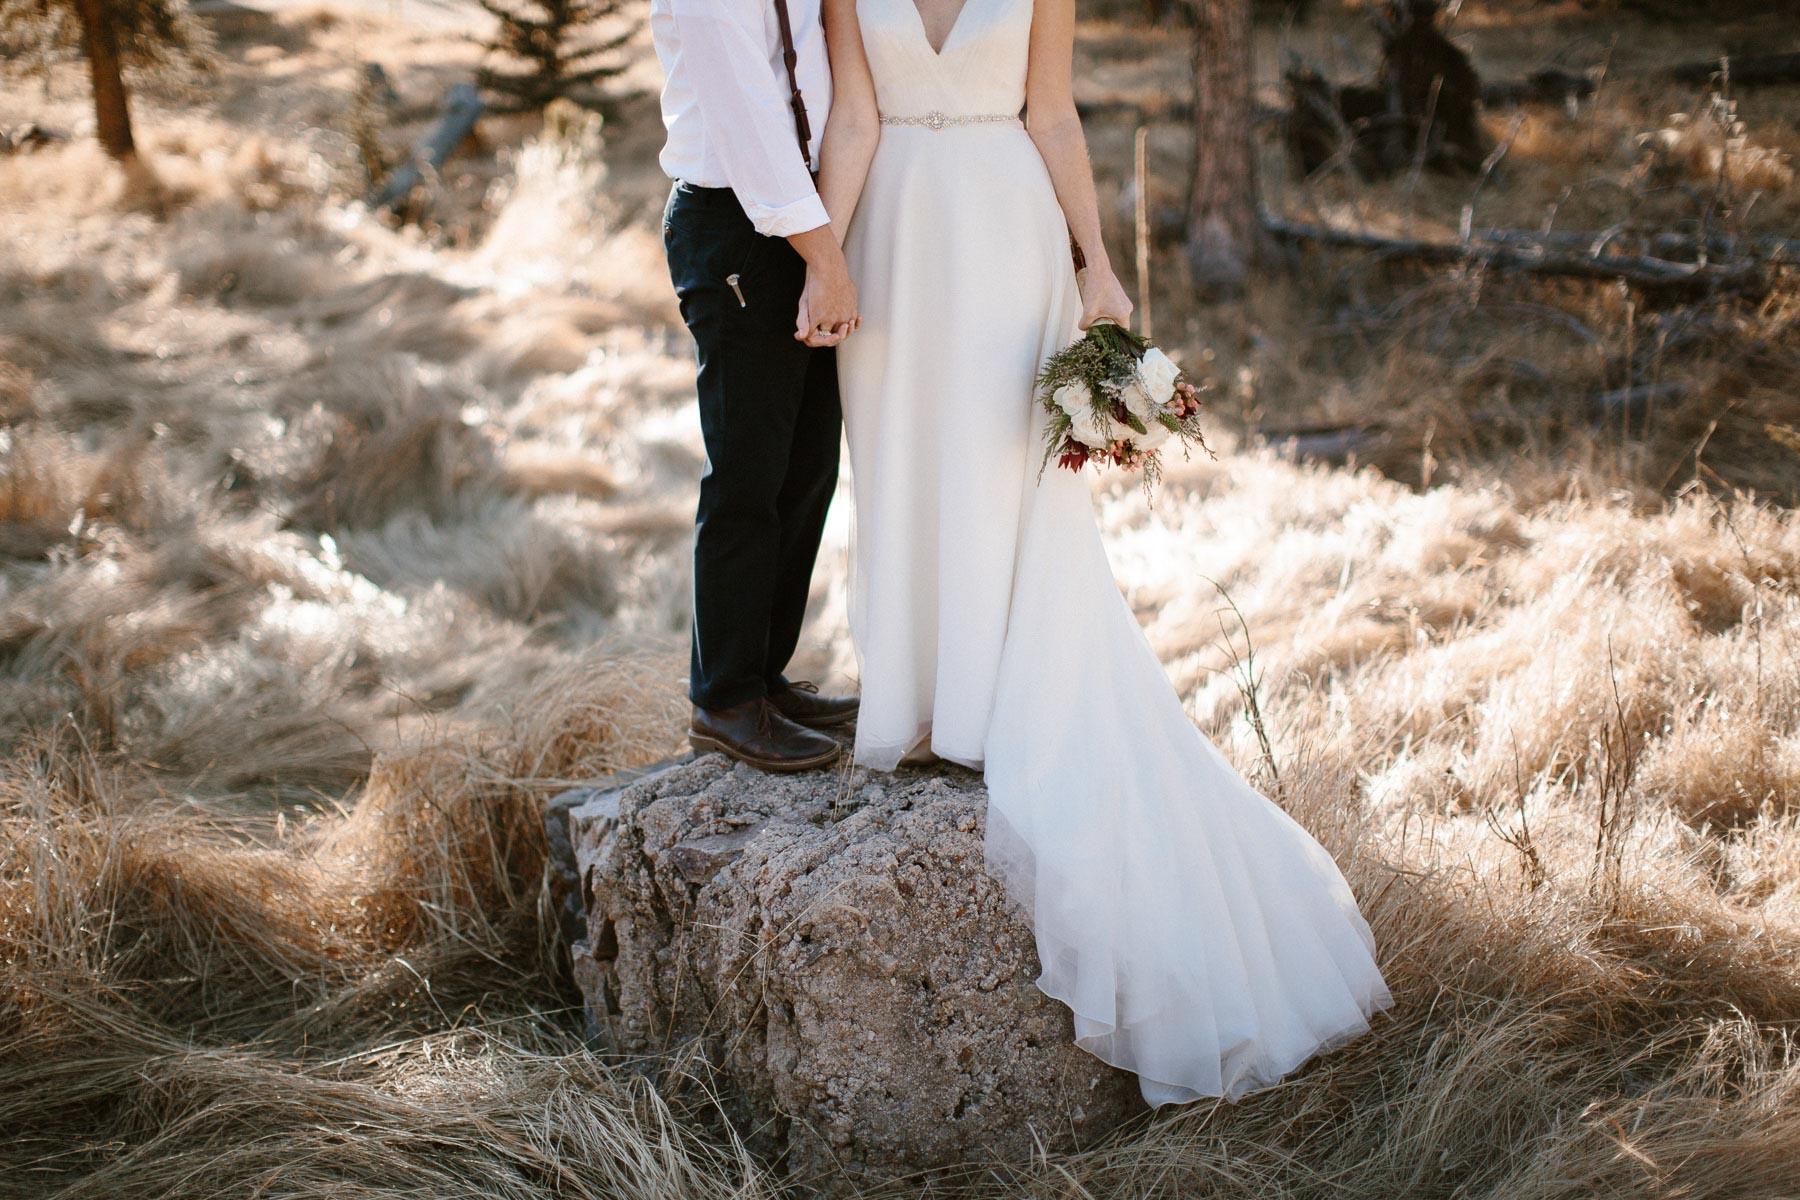 sioux-falls-black-hills-rapid-city-elopement-wedding-adventure-photographer-custer-sylvan-lake-25.jpg